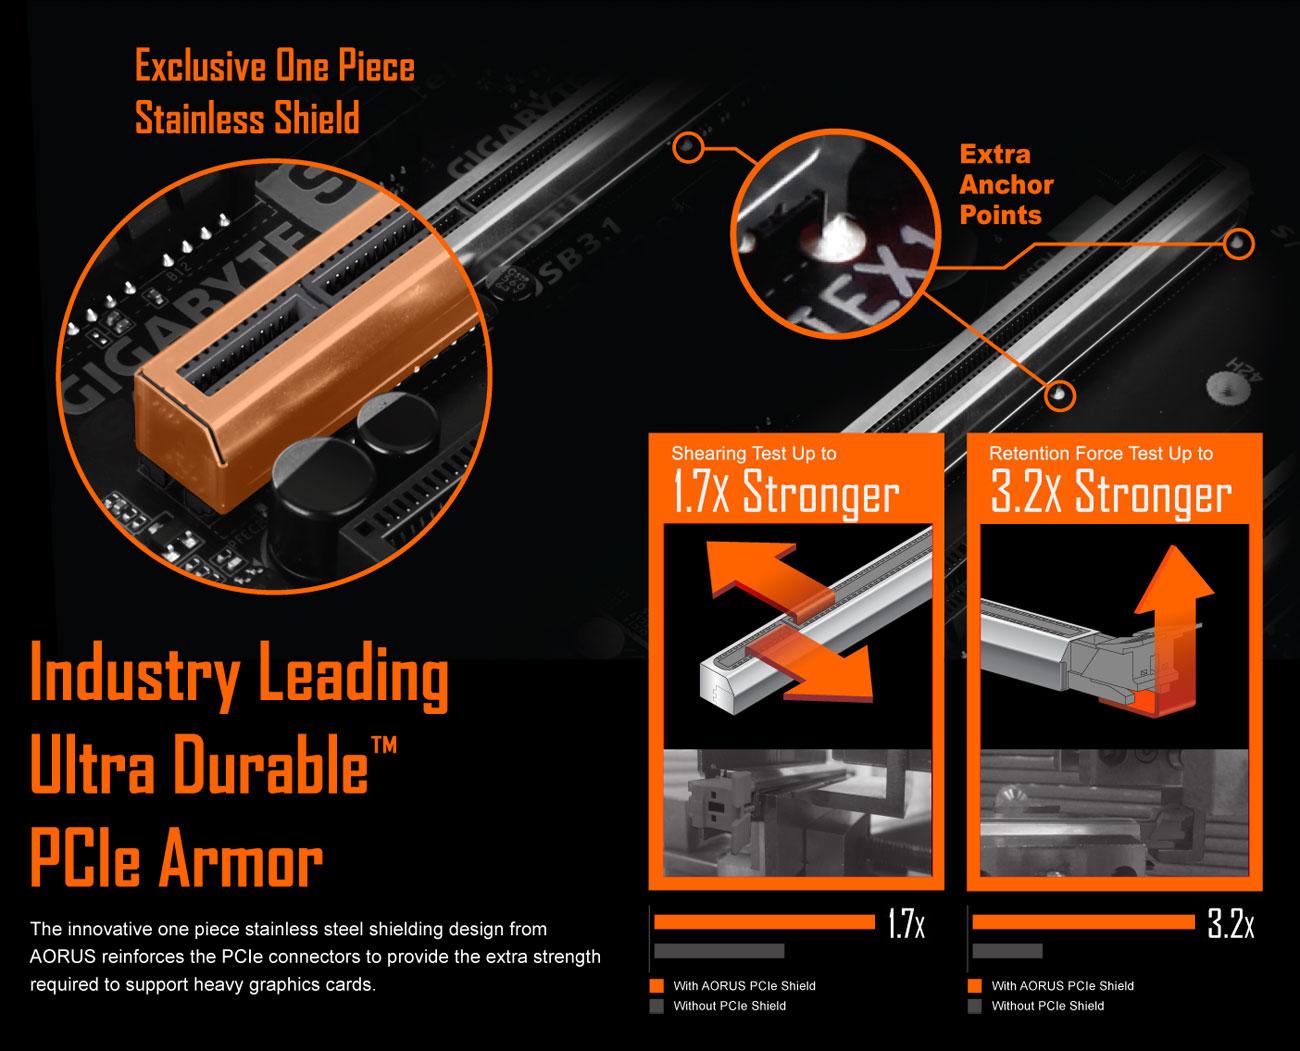 Z370 Aorus Gaming 3 Rev 10 Motherboard Gigabyte Global Two Way Lighting Diagram Start Sulfurization Protection